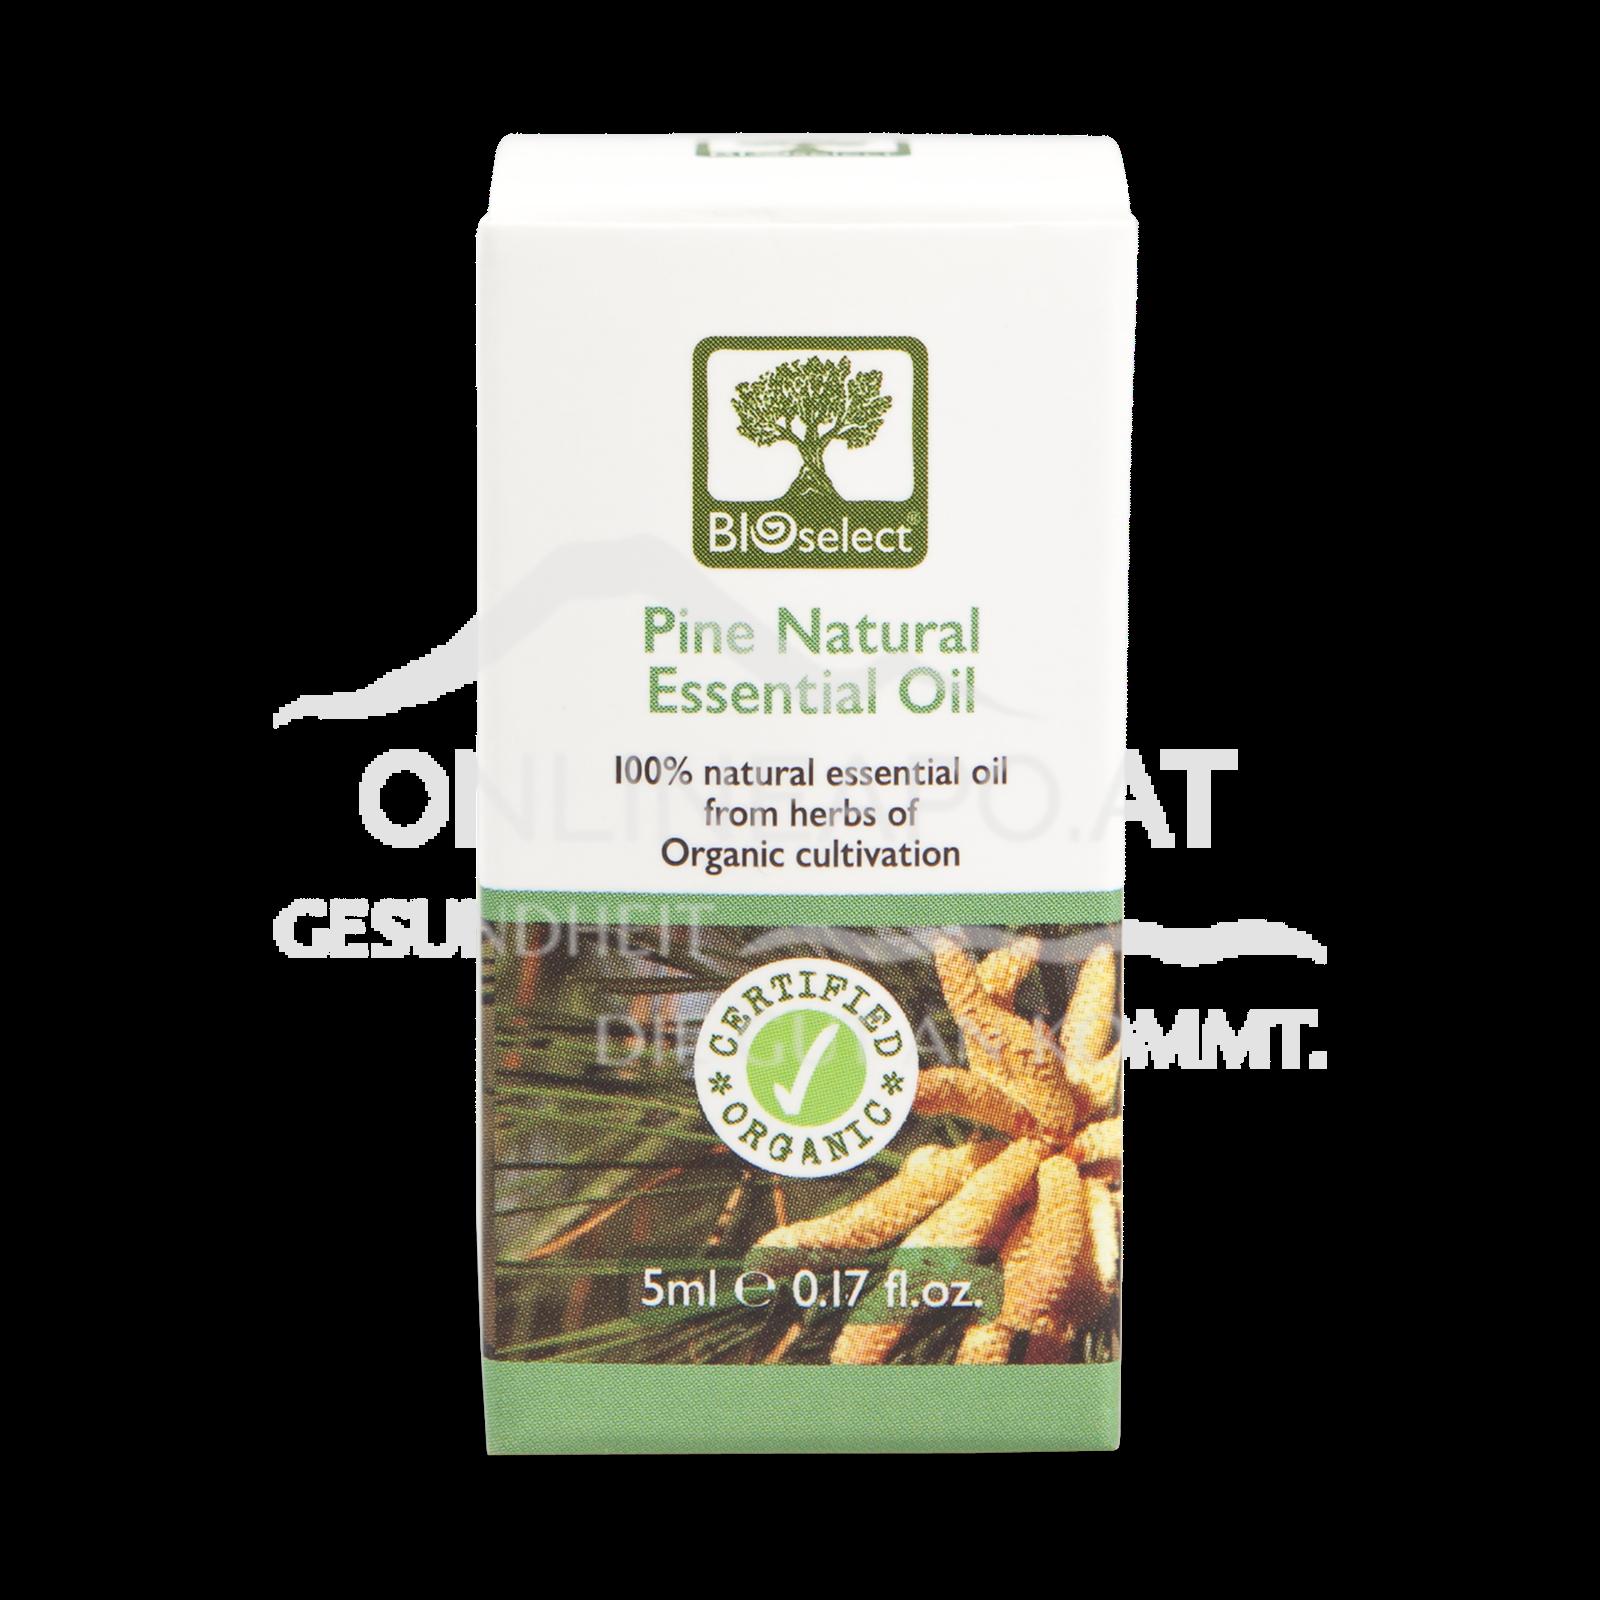 Bioselect Pine Natural Essential Oil Certified Organic